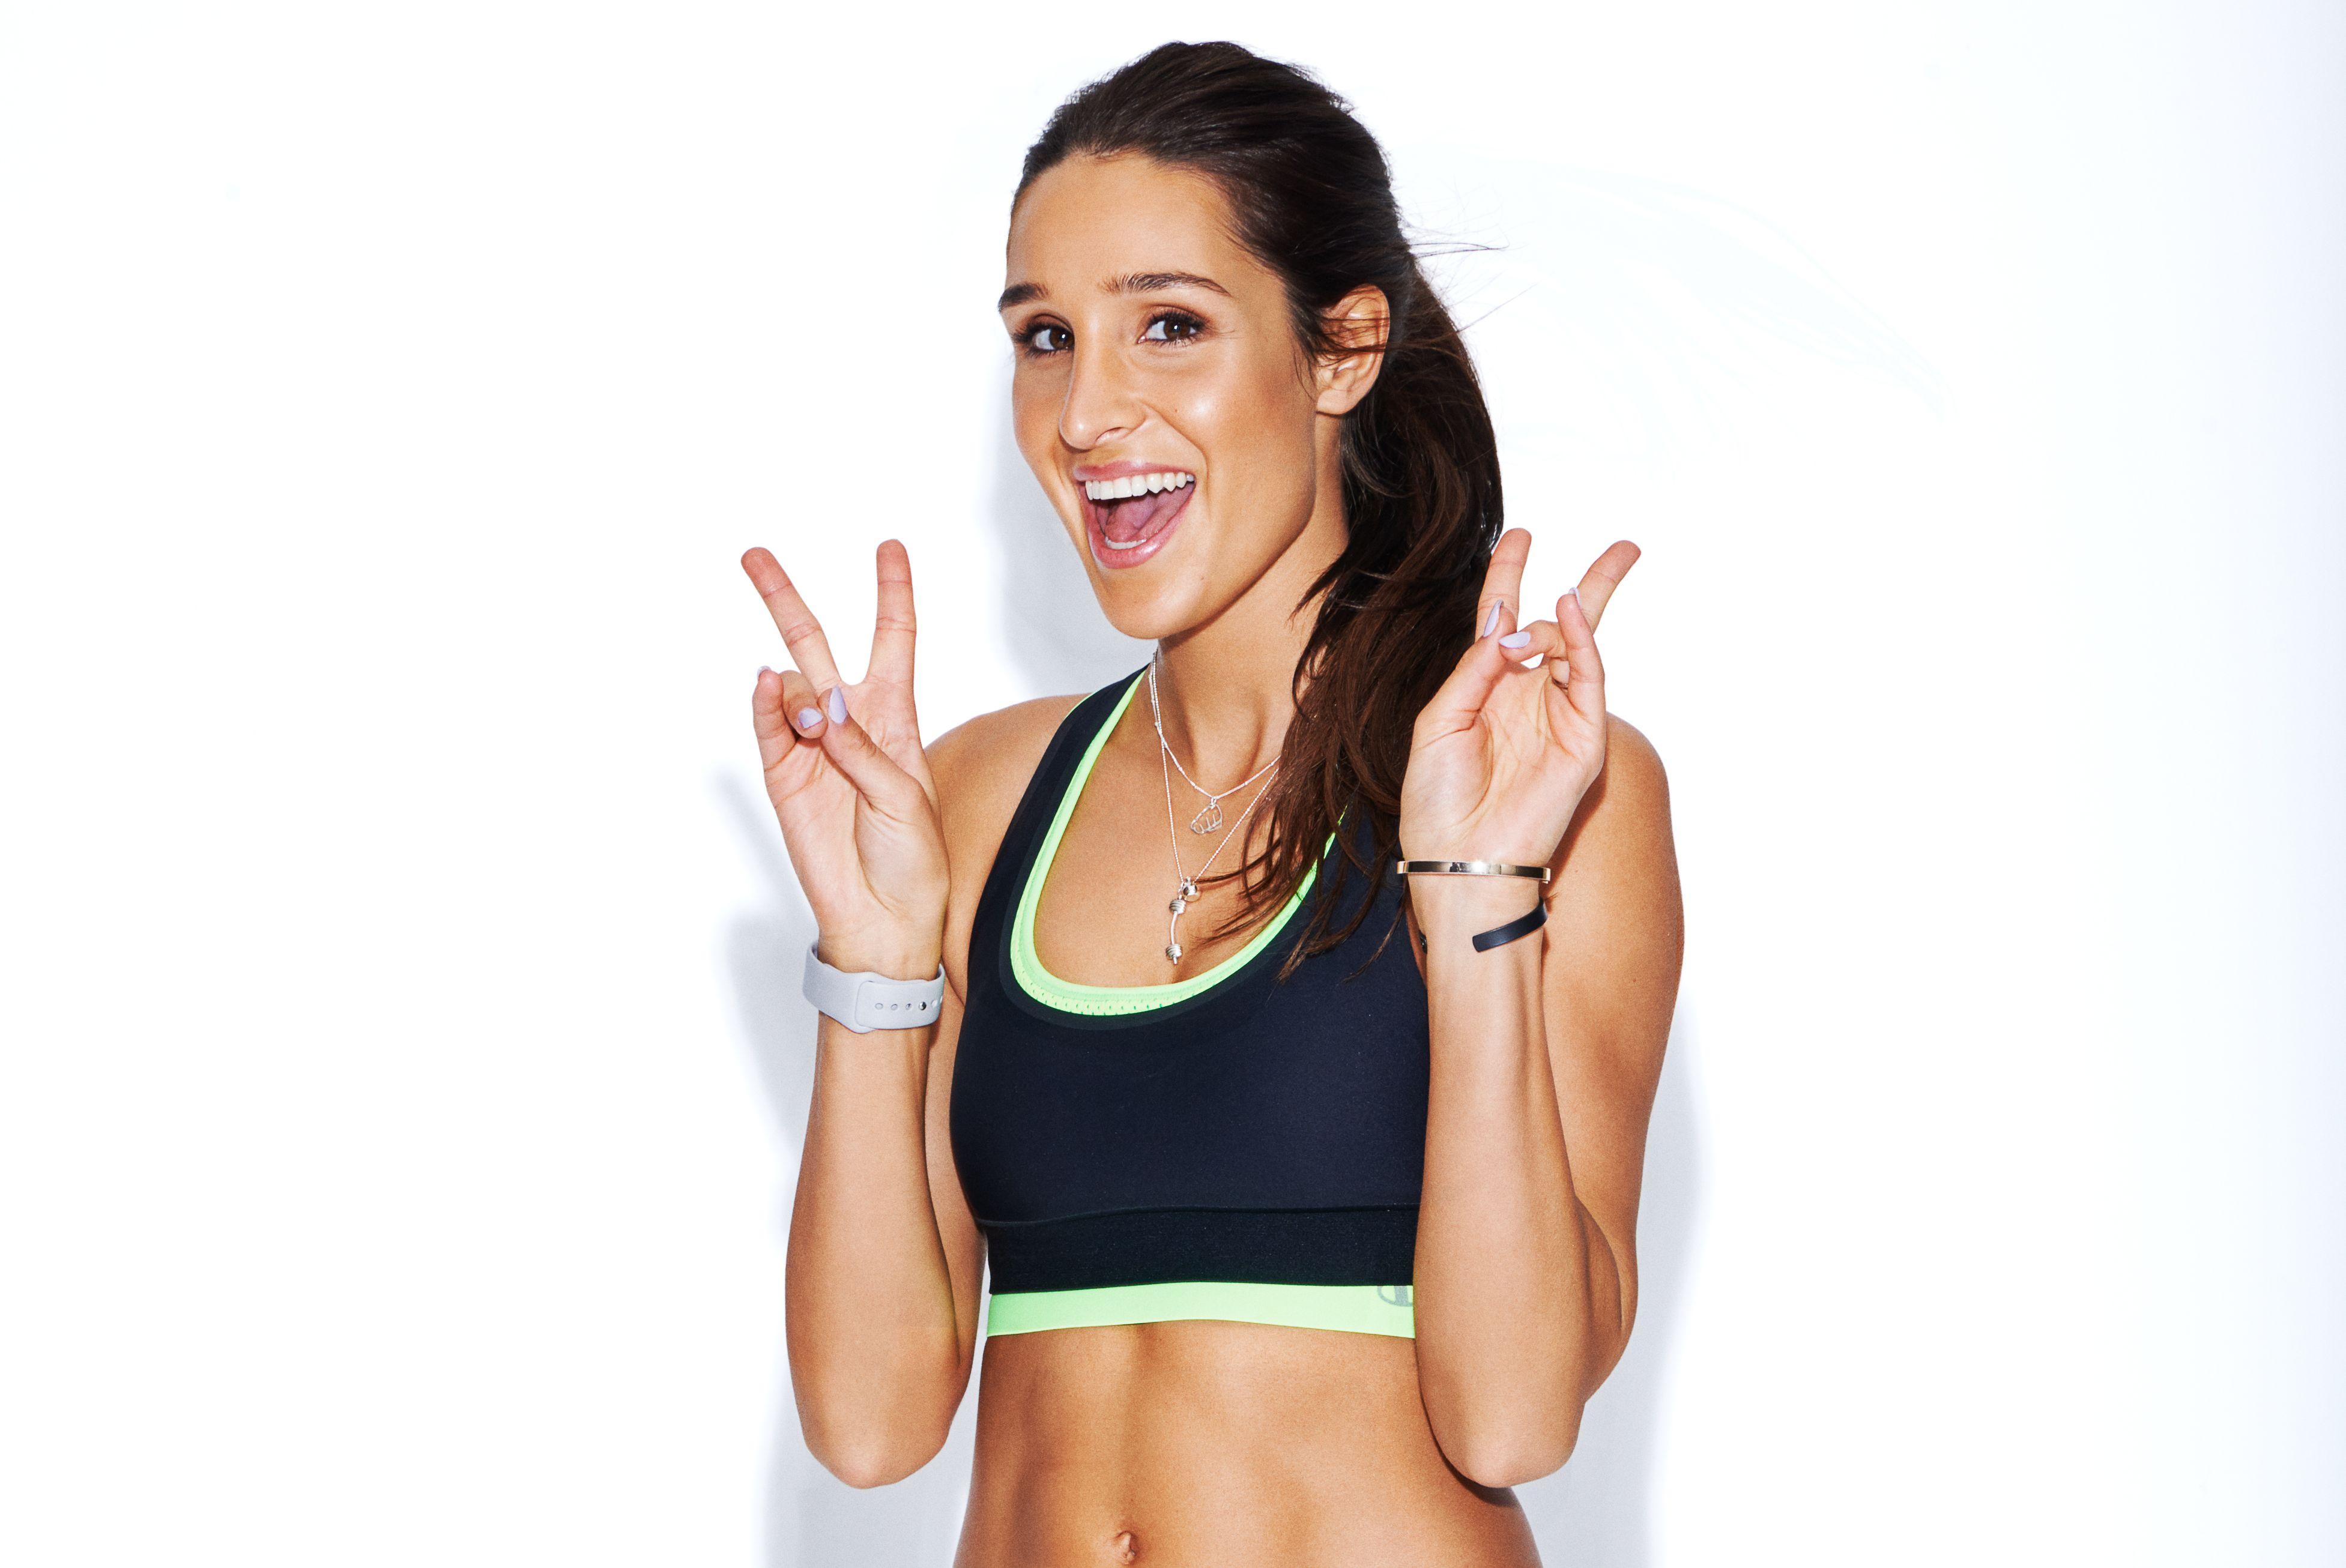 An Easy-to-follow Kayla Itsines Full Body Beginner Workout